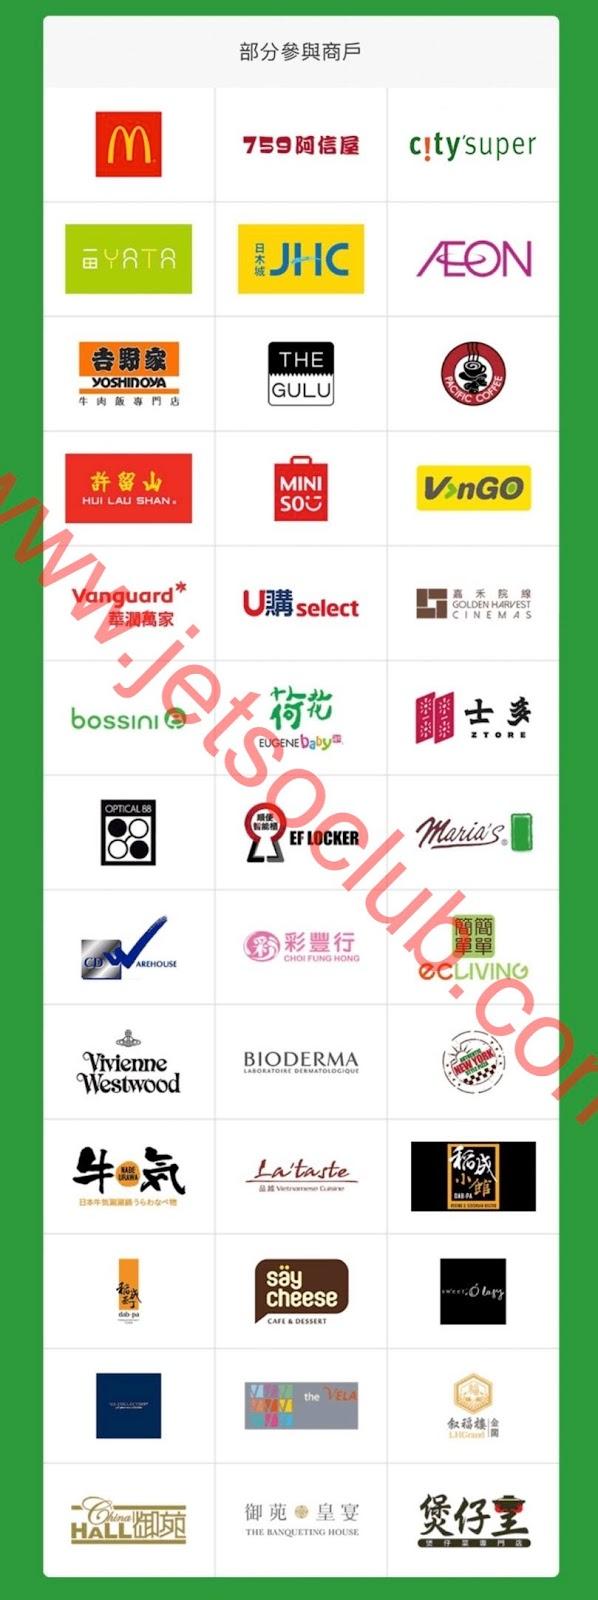 WeChat Pay HK:碼上日日賺 指定商戶 高達$88獎賞(至30/6) ( Jetso Club 著數俱樂部 )